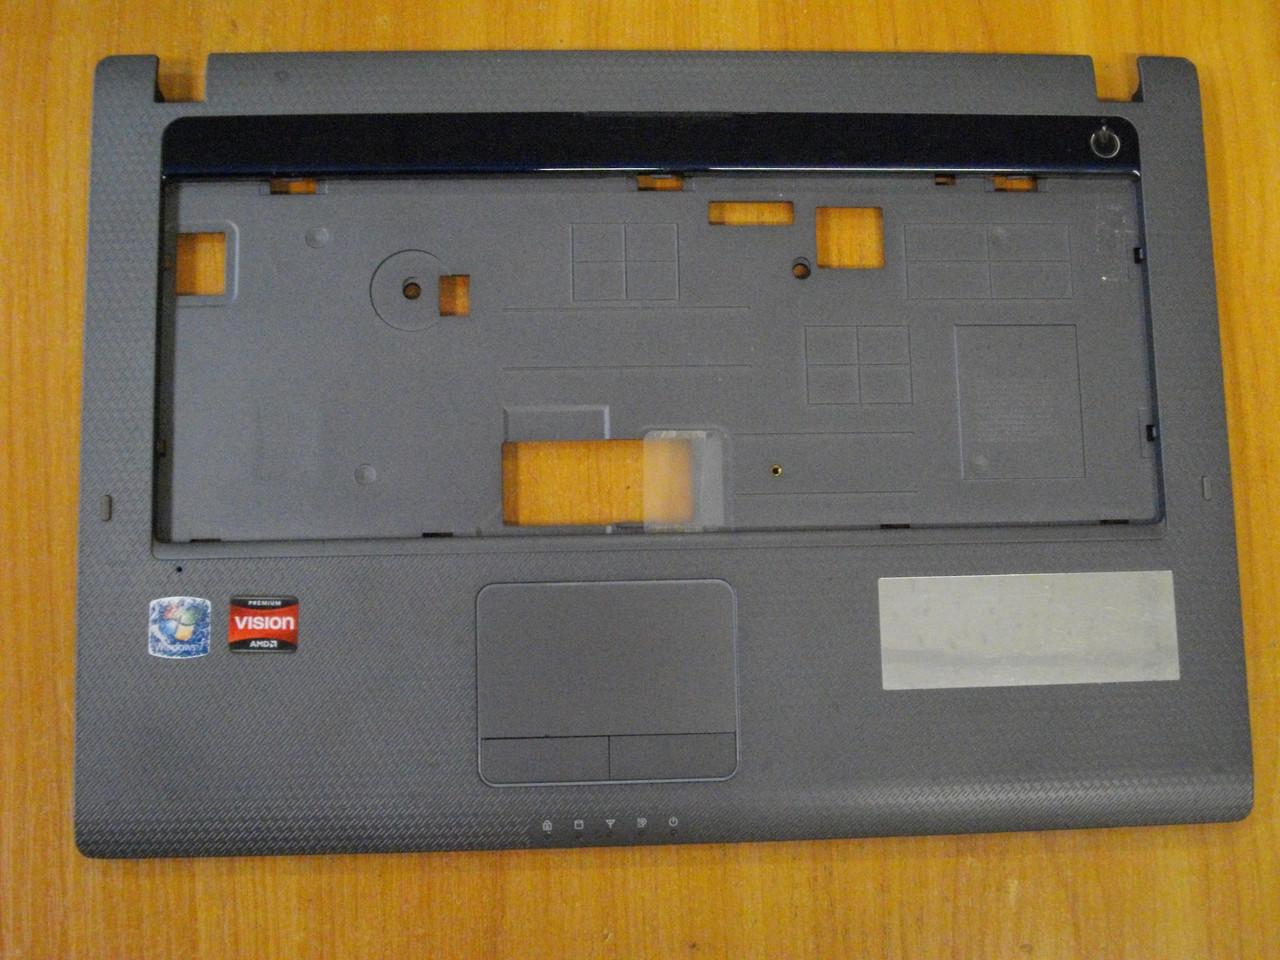 Корпус Каркас Средняя часть, верхняя часть корпуса с тачпадом Samsung R425 R428 R430 BA75-02421A бу